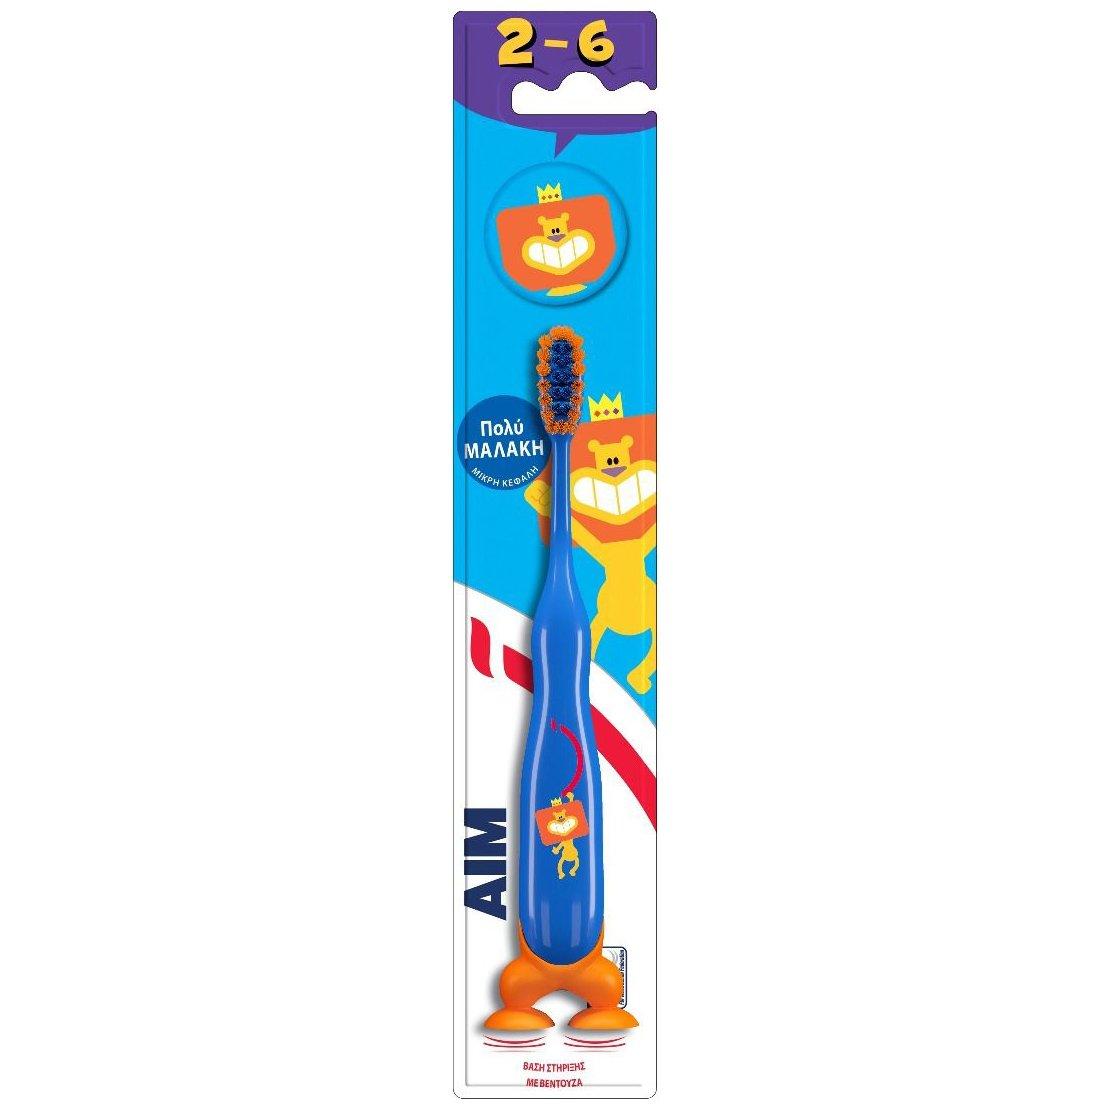 Aim Παιδική Οδοντόβουρτσα Πολύ Μαλακή με Μικρή Κεφαλή, Βάση Στήριξης με Βεντούζα & Καπάκι Προστατευτικό, από 2-6 Ετών 1 Τεμάχιο – μπλέ